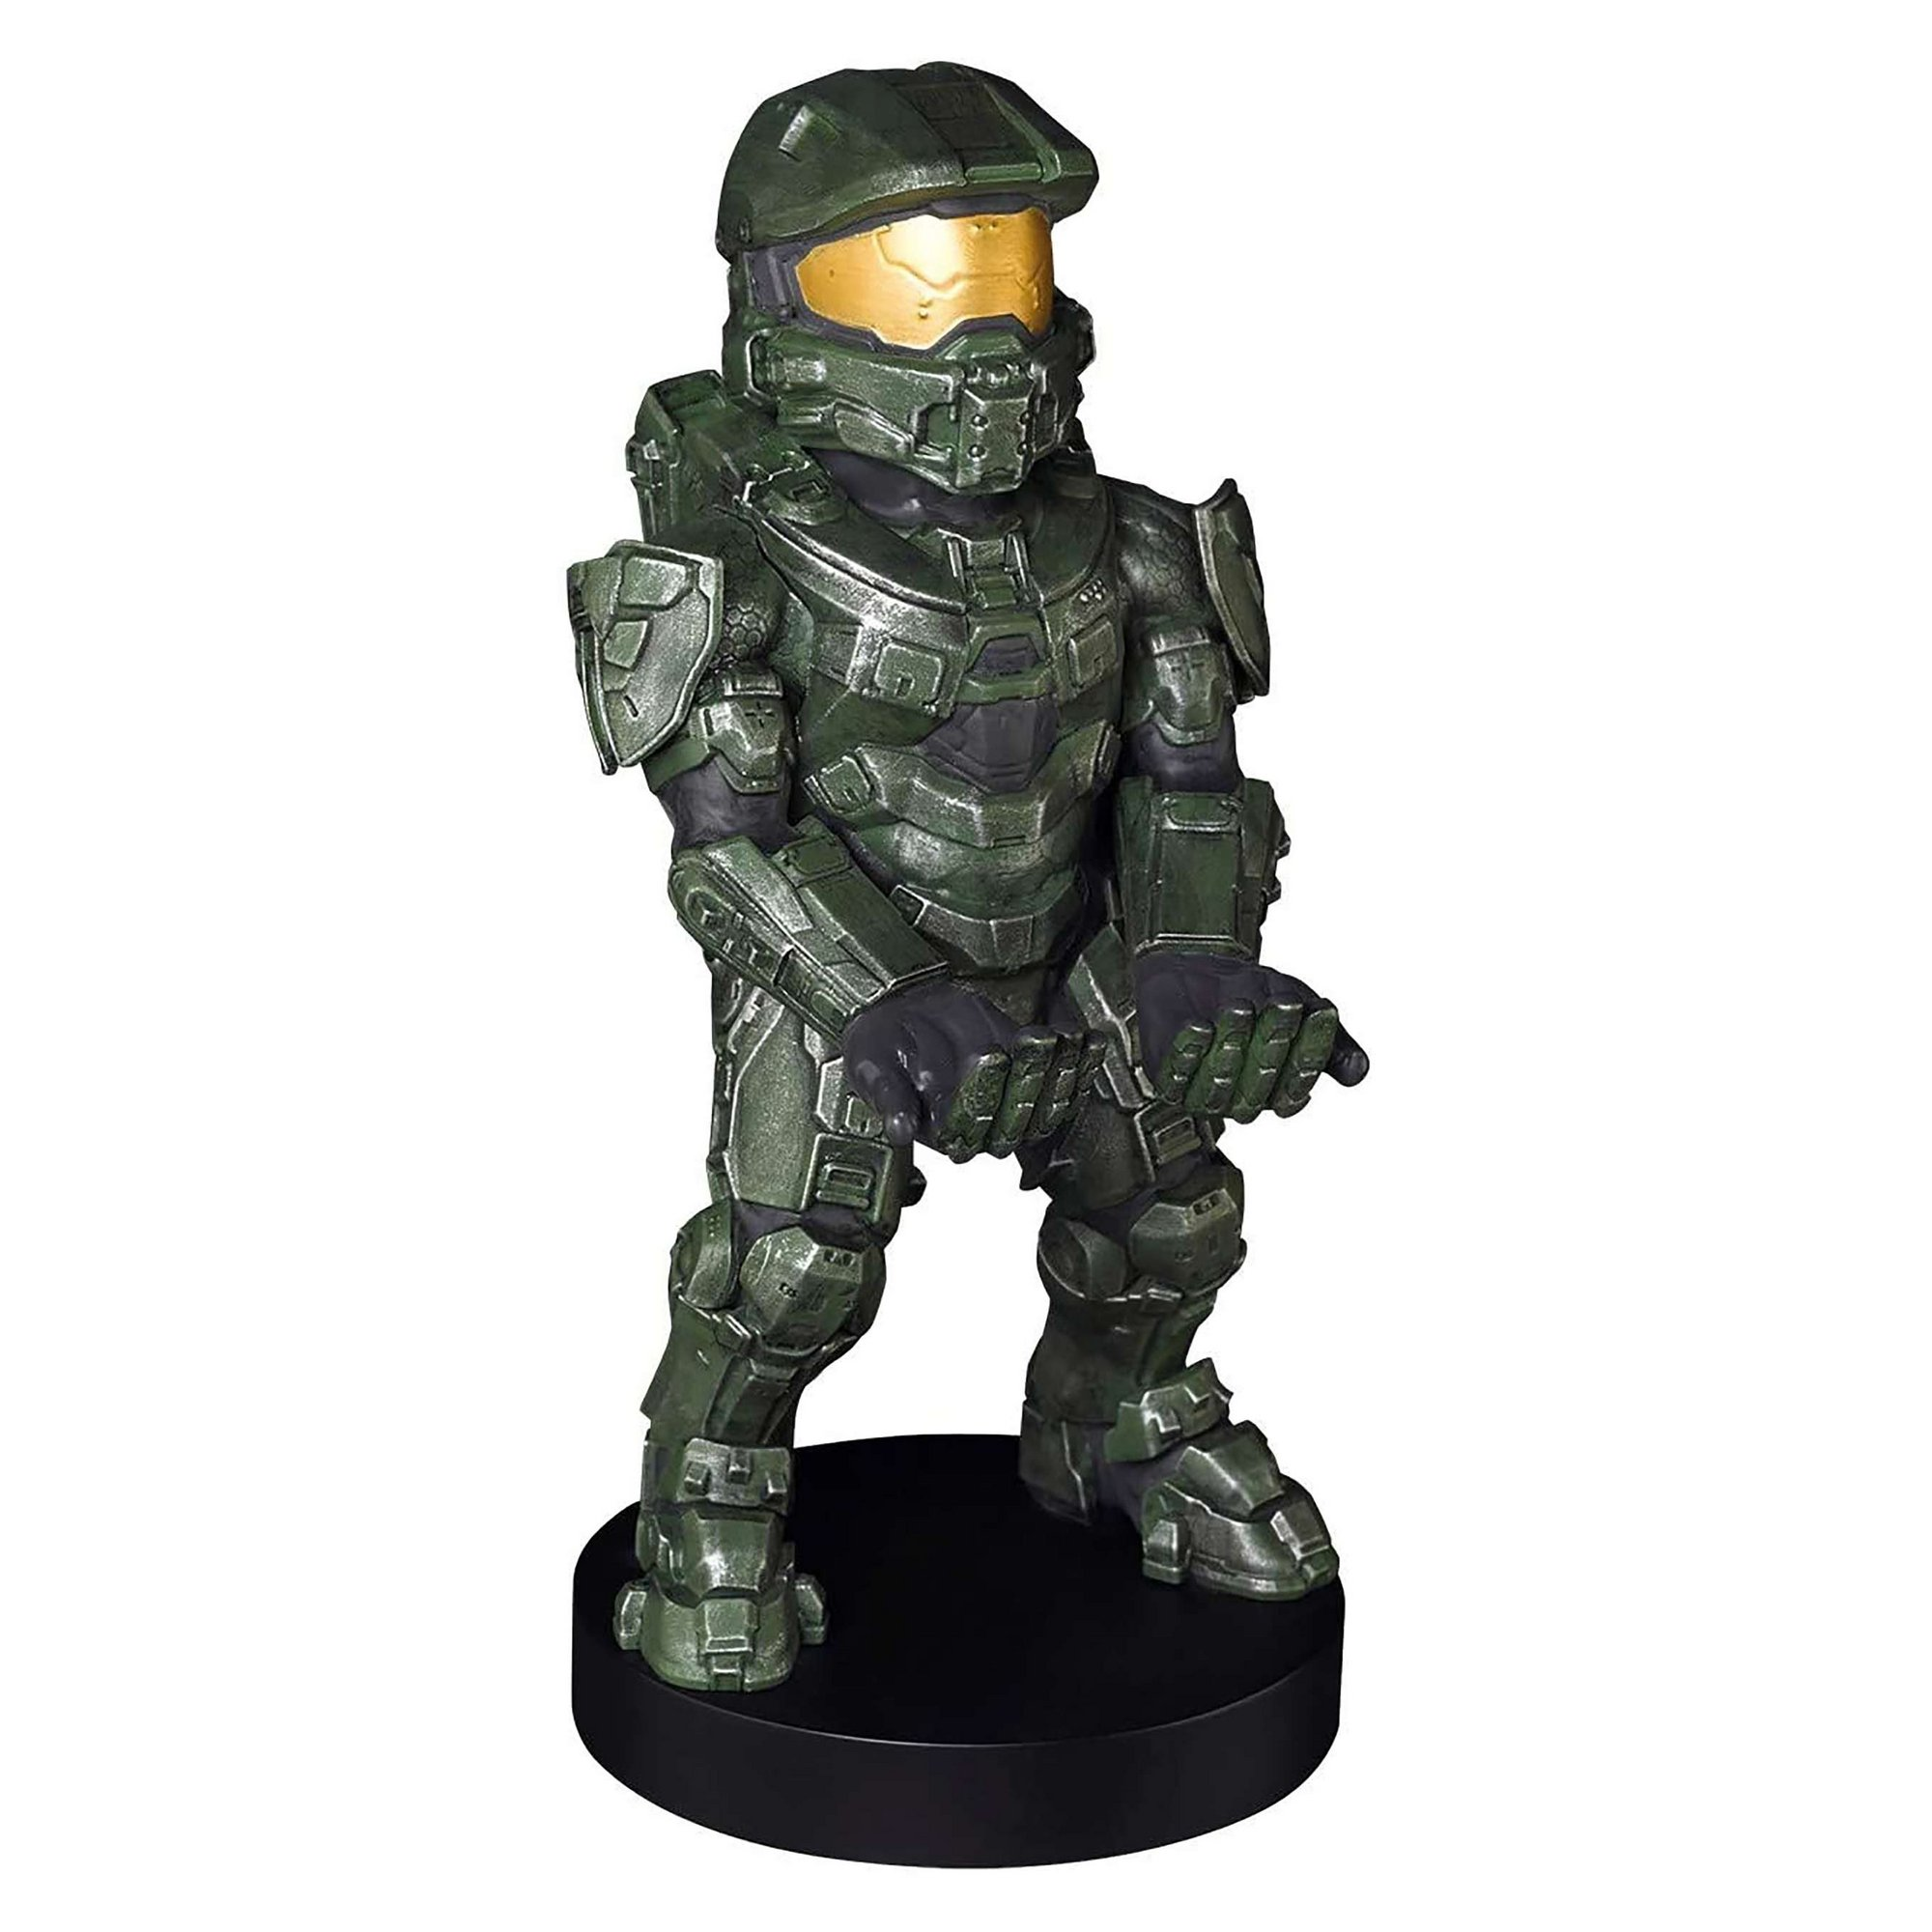 Image of CG Halo Master Chief Holder